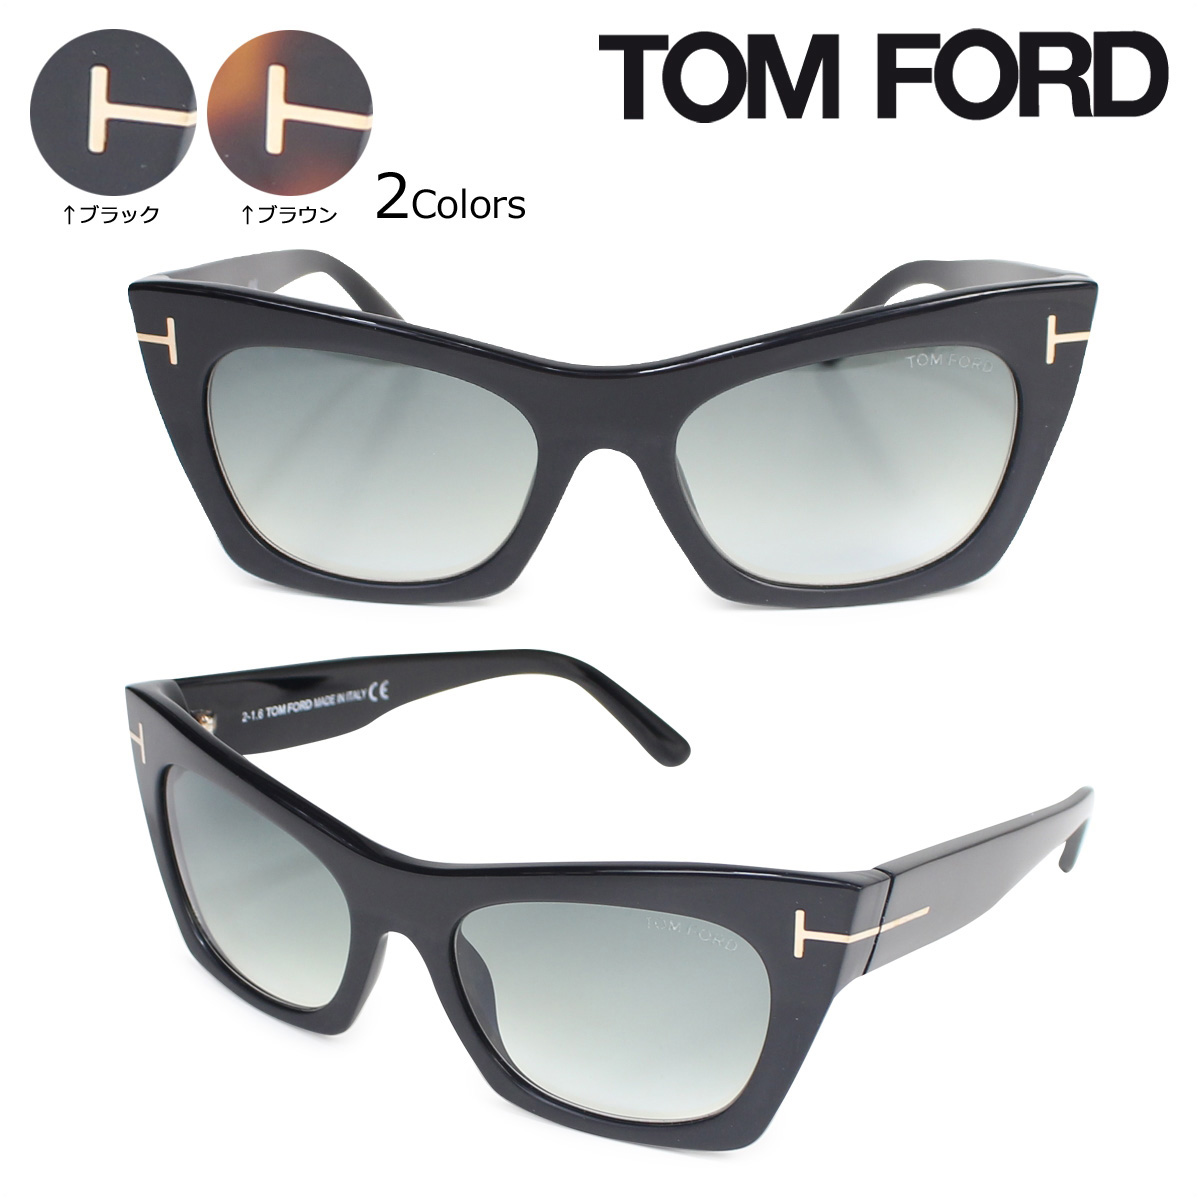 TOM FORD トムフォード サングラス メガネ メンズ レディース アイウェア FT0459 KASIA SUNGLASSES 2カラー